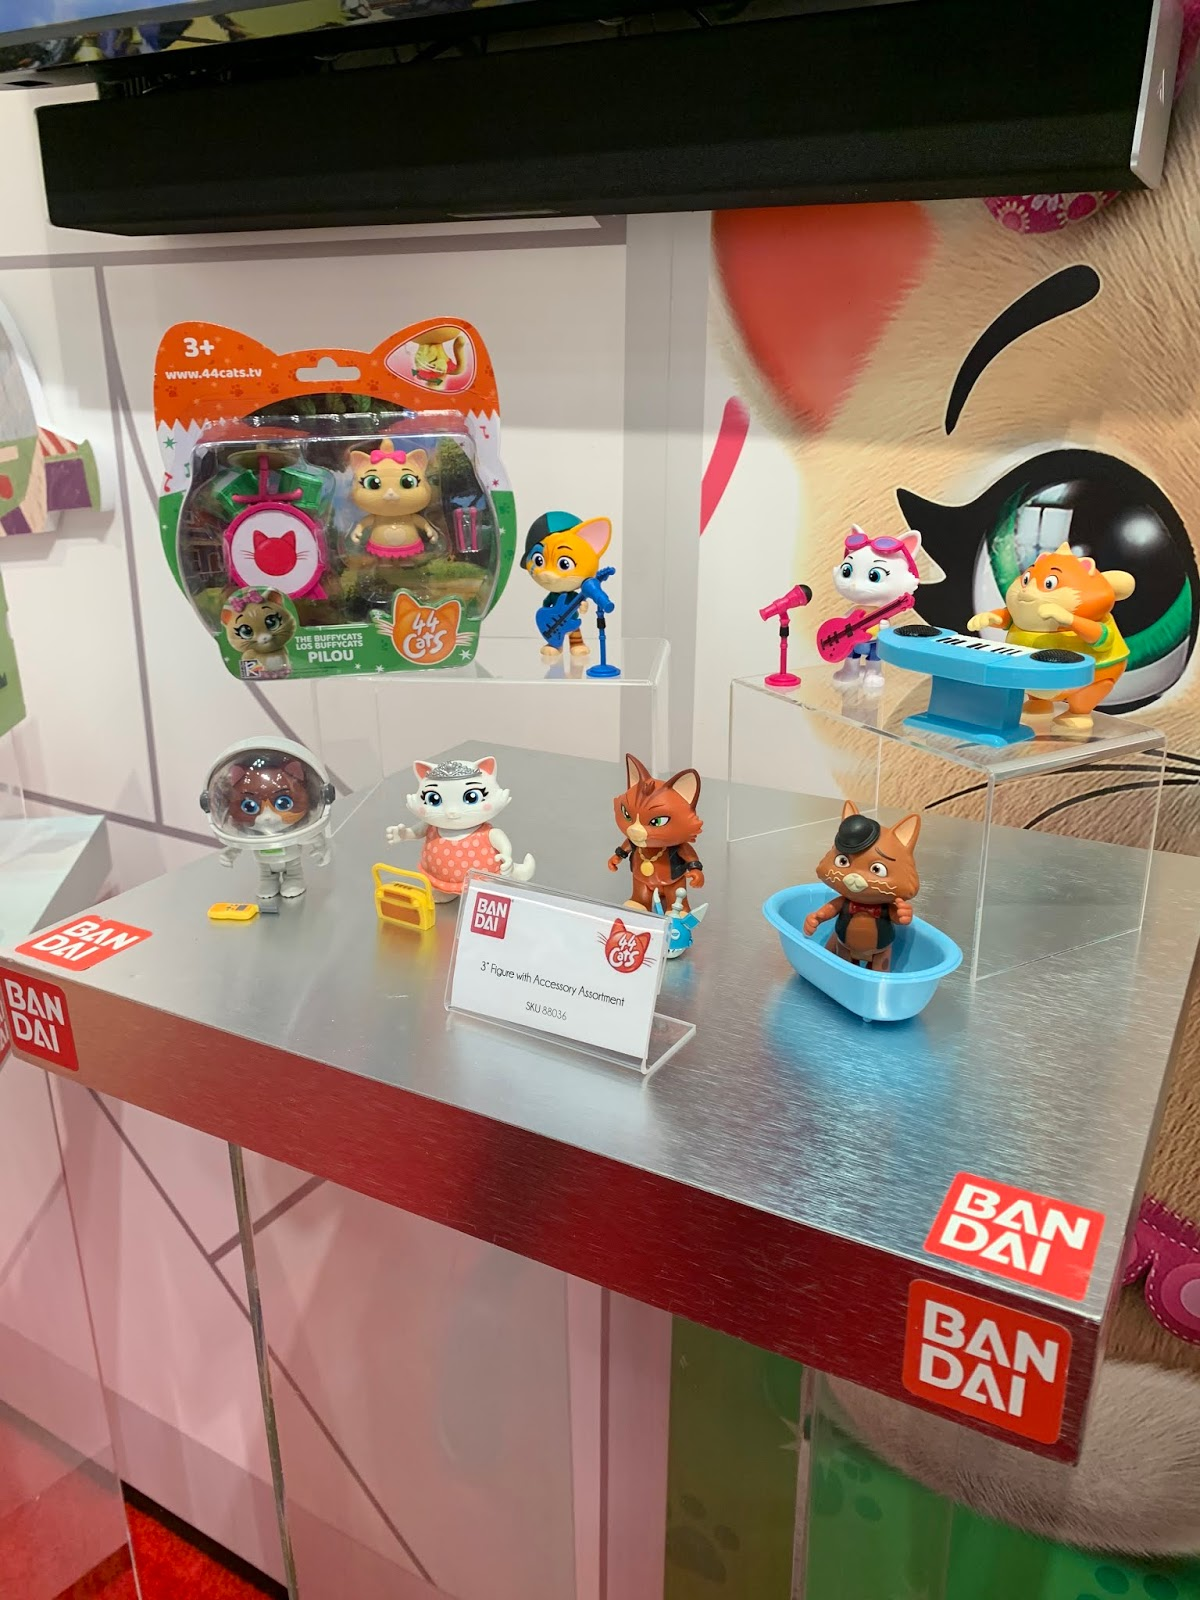 Nick Jr 44 Cats : NickALive!:, Nickelodeon, International, Acquires, Cats', Season